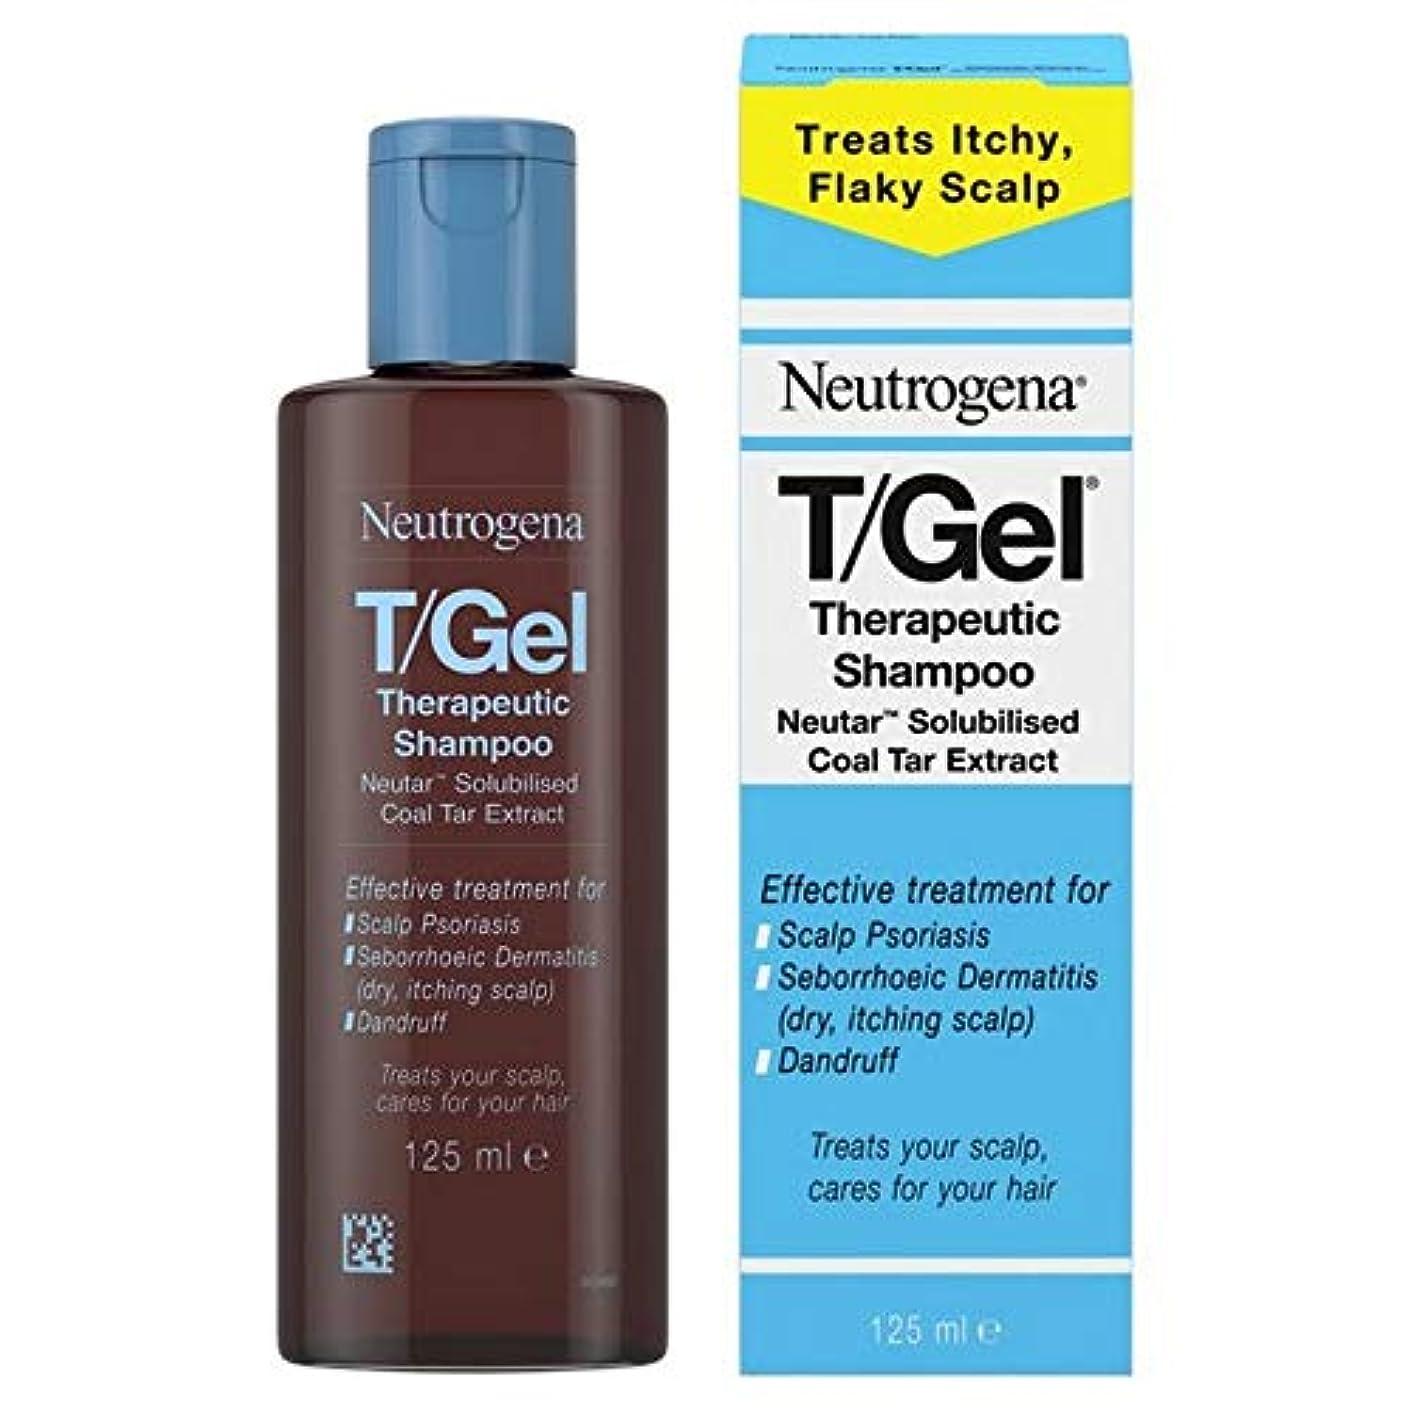 [Neutrogena ] ニュートロジーナのT /ゲル治療シャンプー125ミリリットル - Neutrogena T/Gel Therapeutic Shampoo 125ml [並行輸入品]